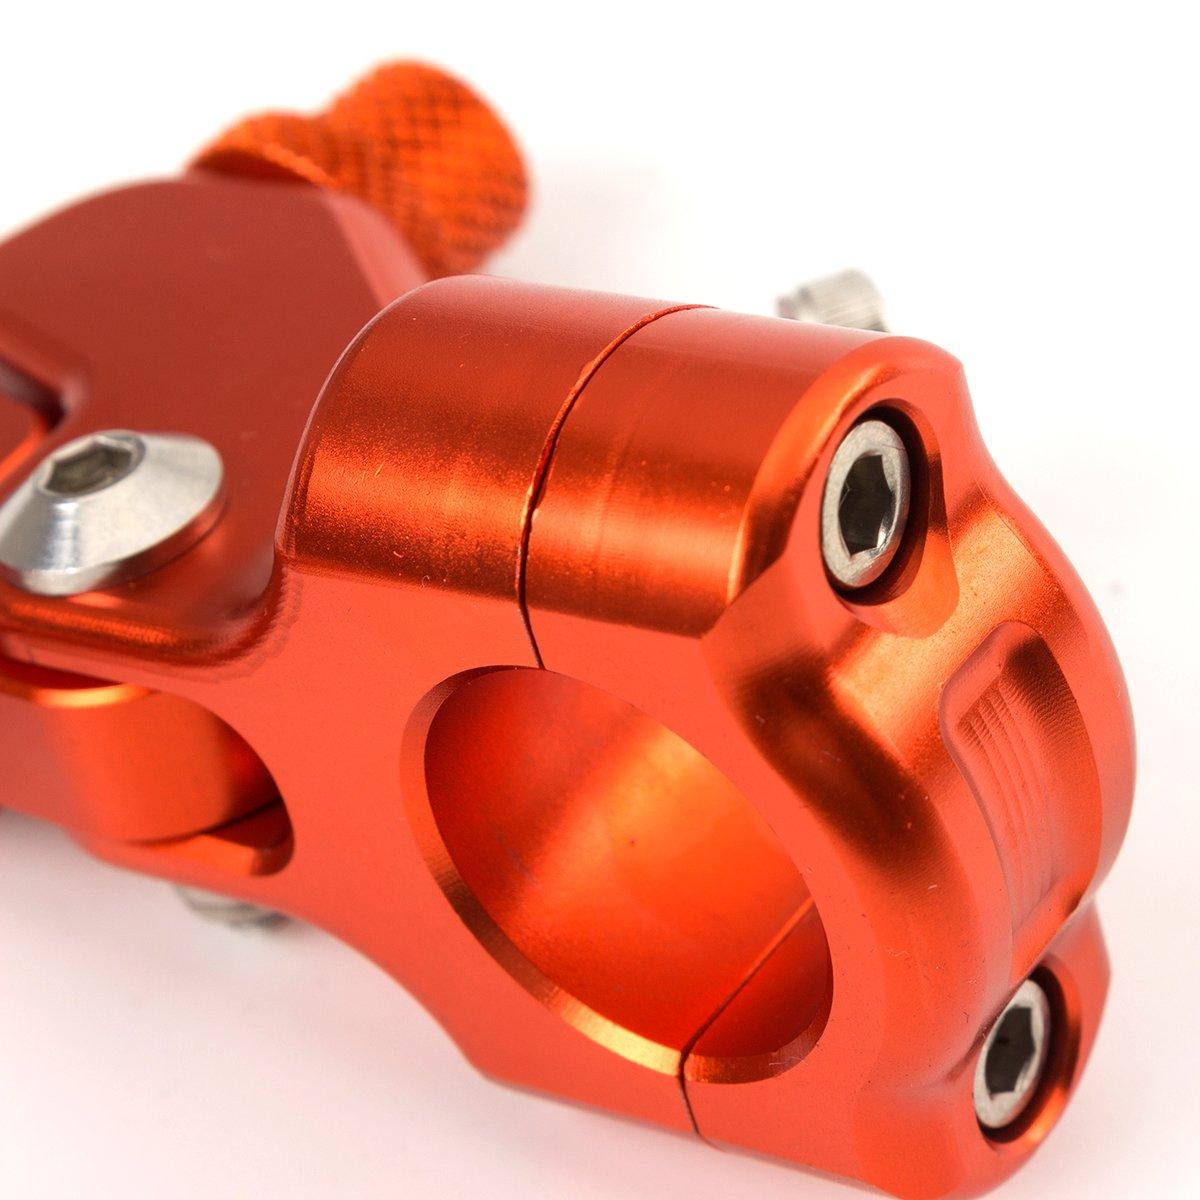 CNC Aluminum Universal Performance Stunt Clutch Lever Mount Bracket Anodized for Honda CBR300R 2014-2016, CBR250R 2011-2013, CB500X 2013-2016, CBR600RR 2007-2015, NC700 S/X, NC750 S/X, GROM, X11 by Rzmmotor (Image #8)